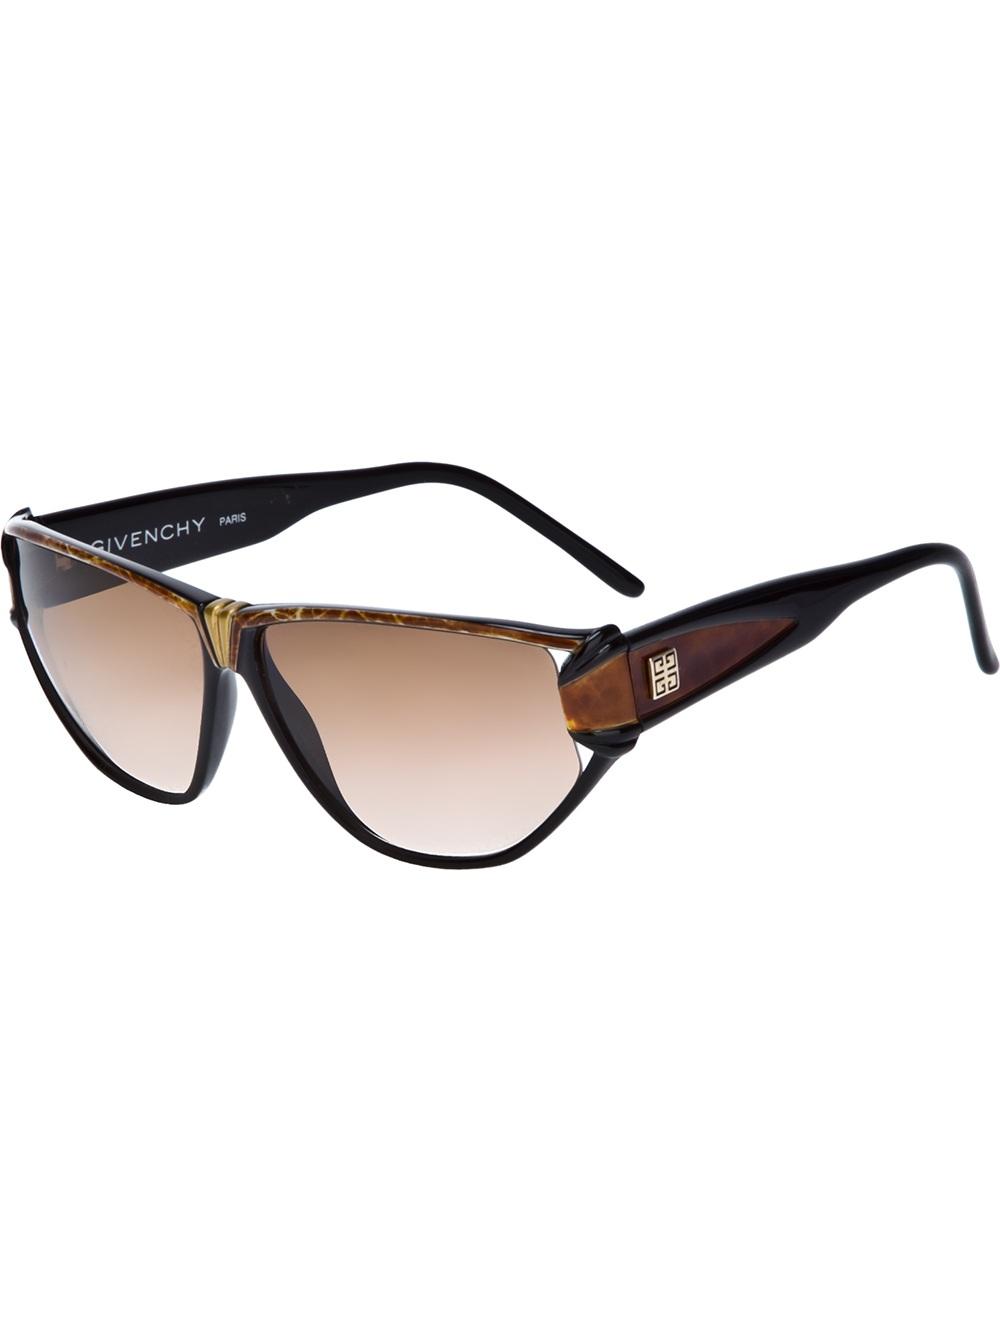 Vintage Aviator Sunglasses 85